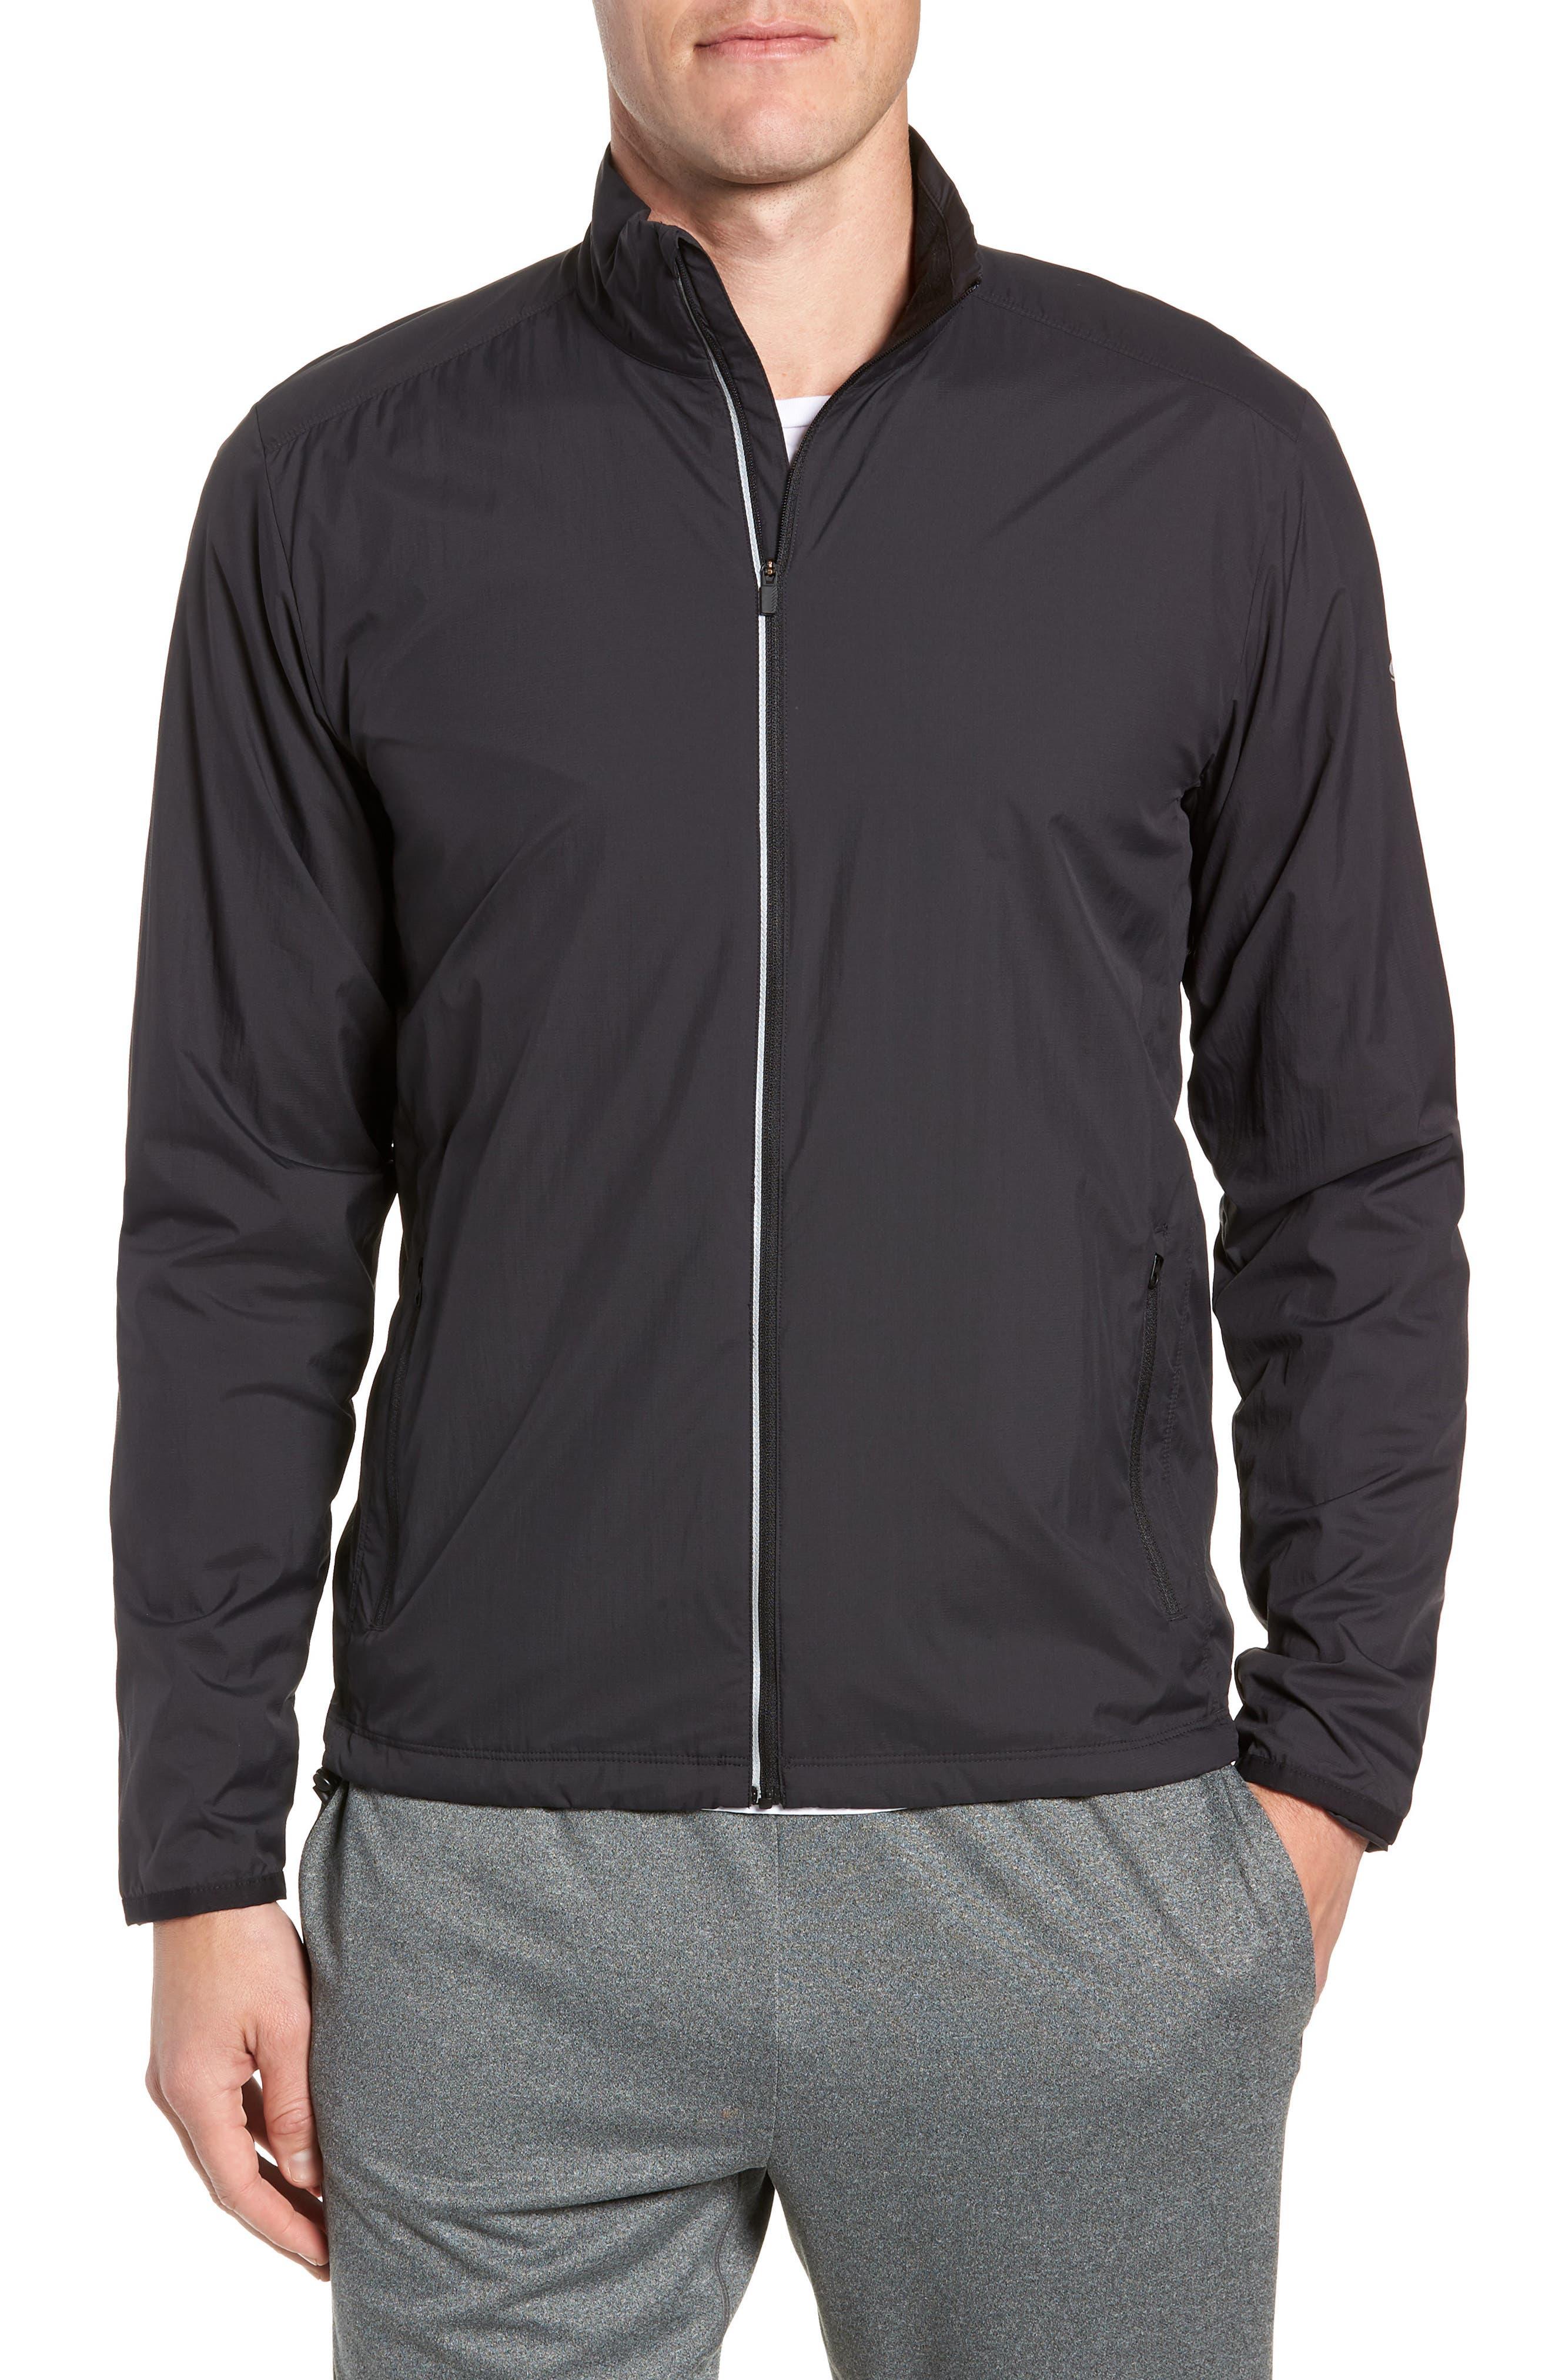 Cool-Lite<sup>™</sup> Incline Windbreaker Jacket,                             Main thumbnail 1, color,                             BLACK